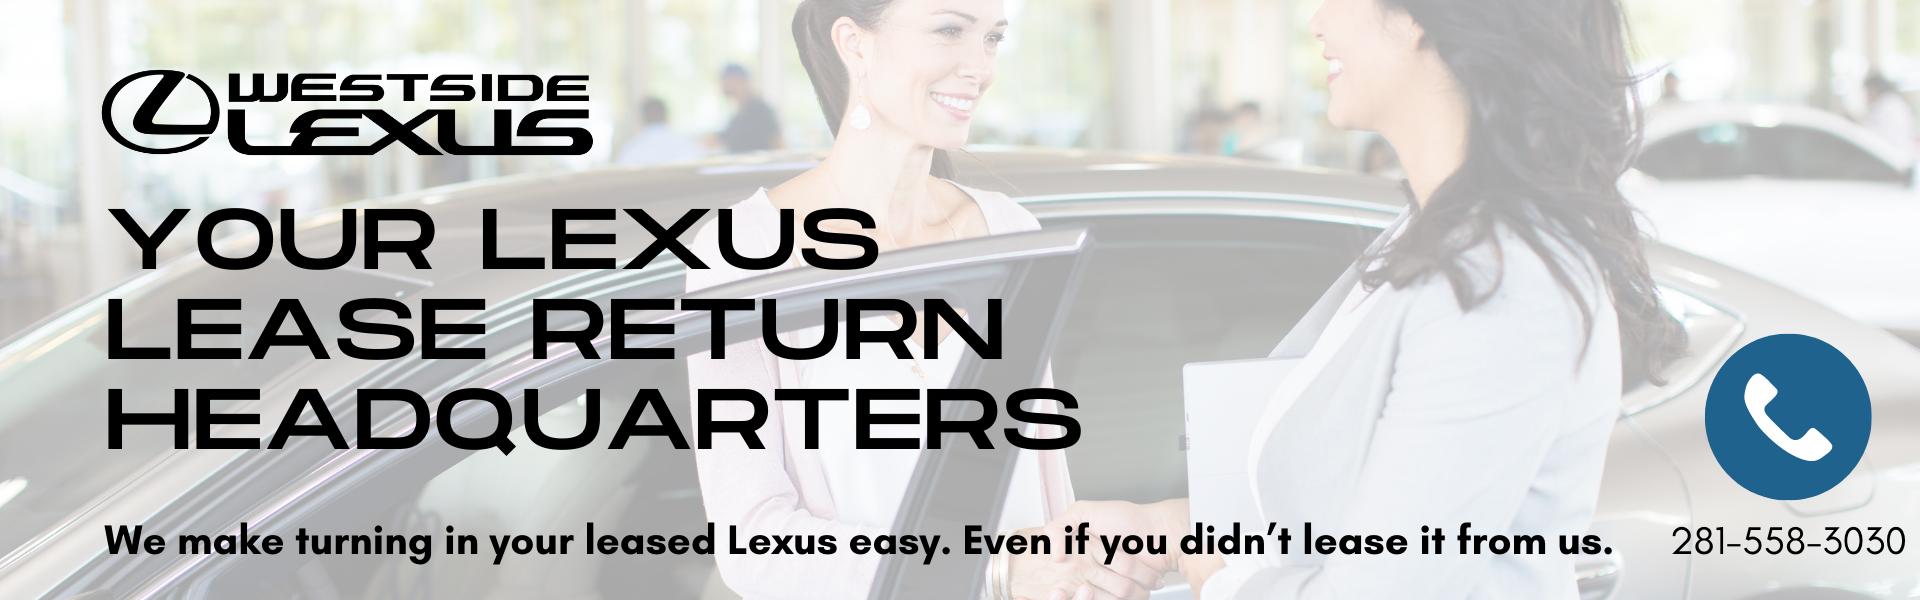 Westside Lexus_Lease Return headquarters_1920x600 (1)